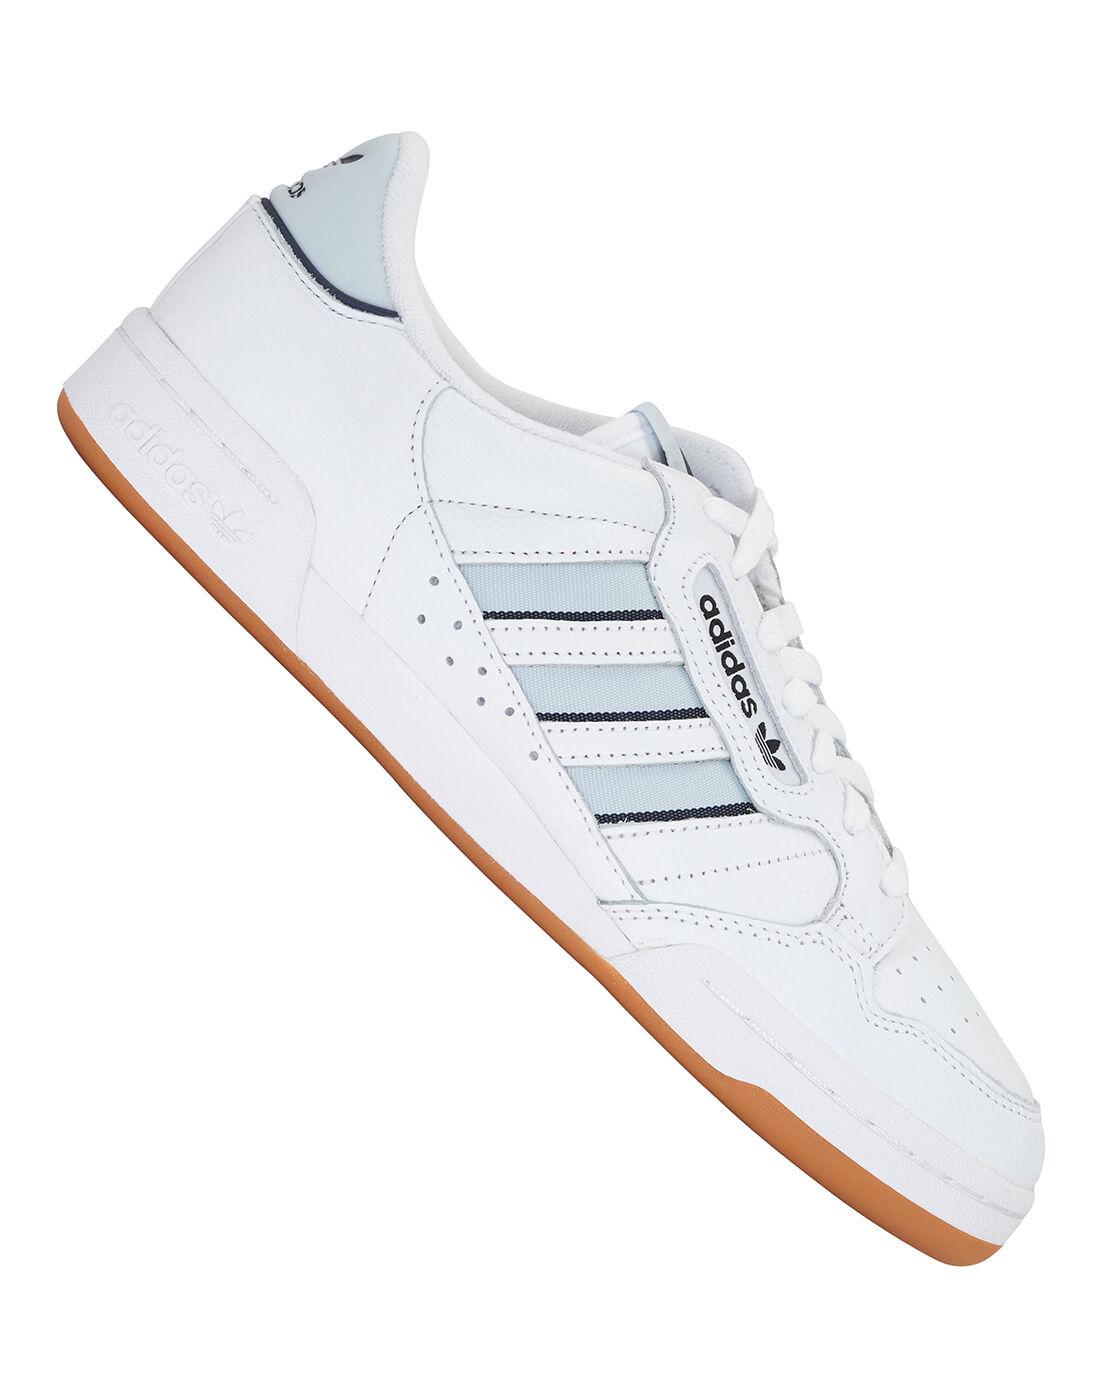 adidas Originals adidas beckenbauer pants black friday sale | Mens Continental 80